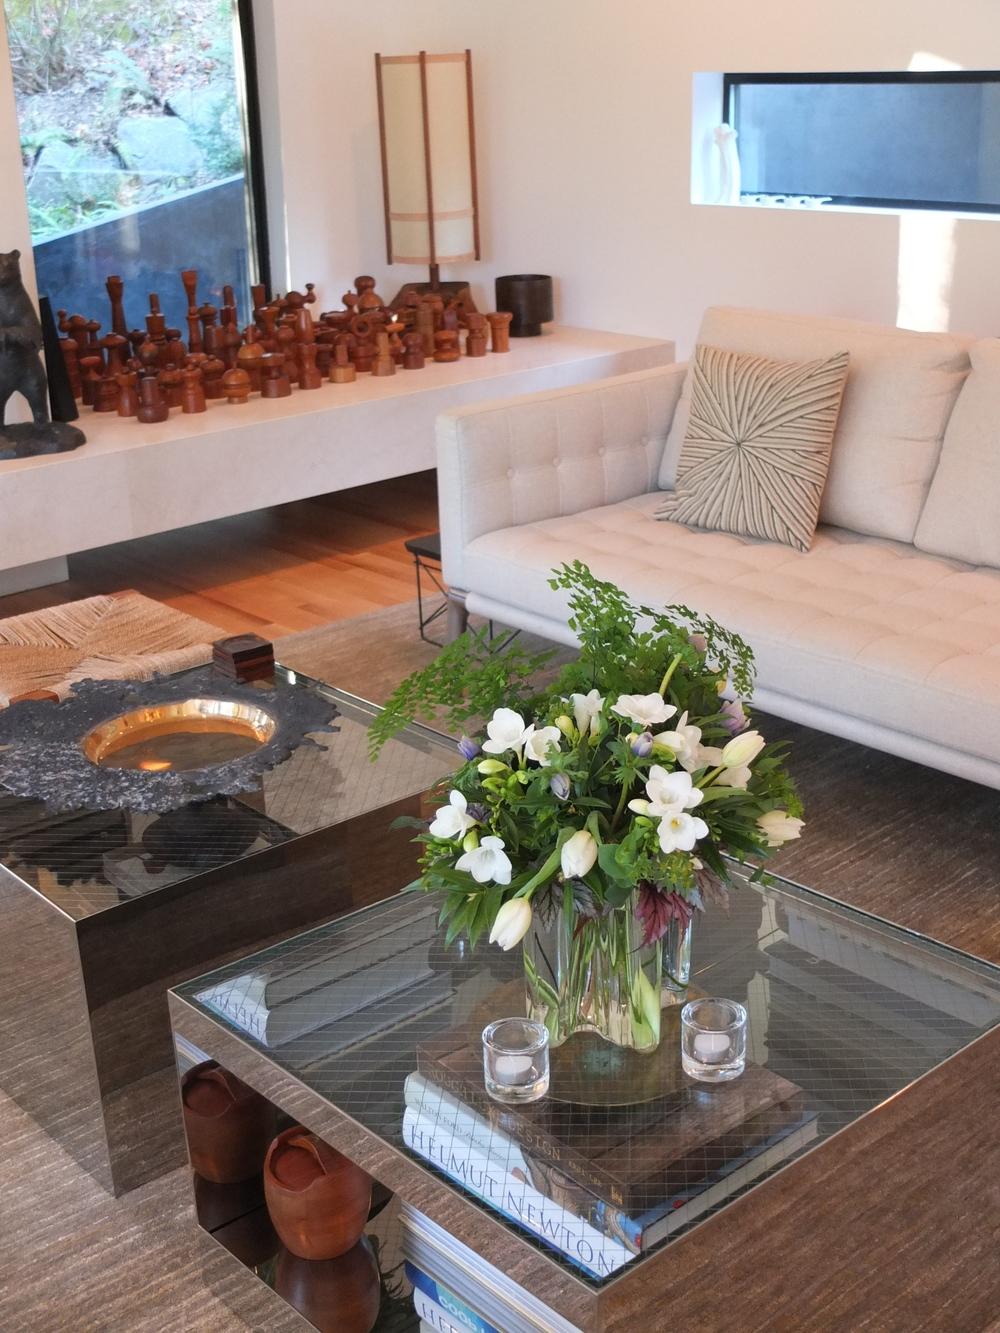 Aalto vase in Hoke living room